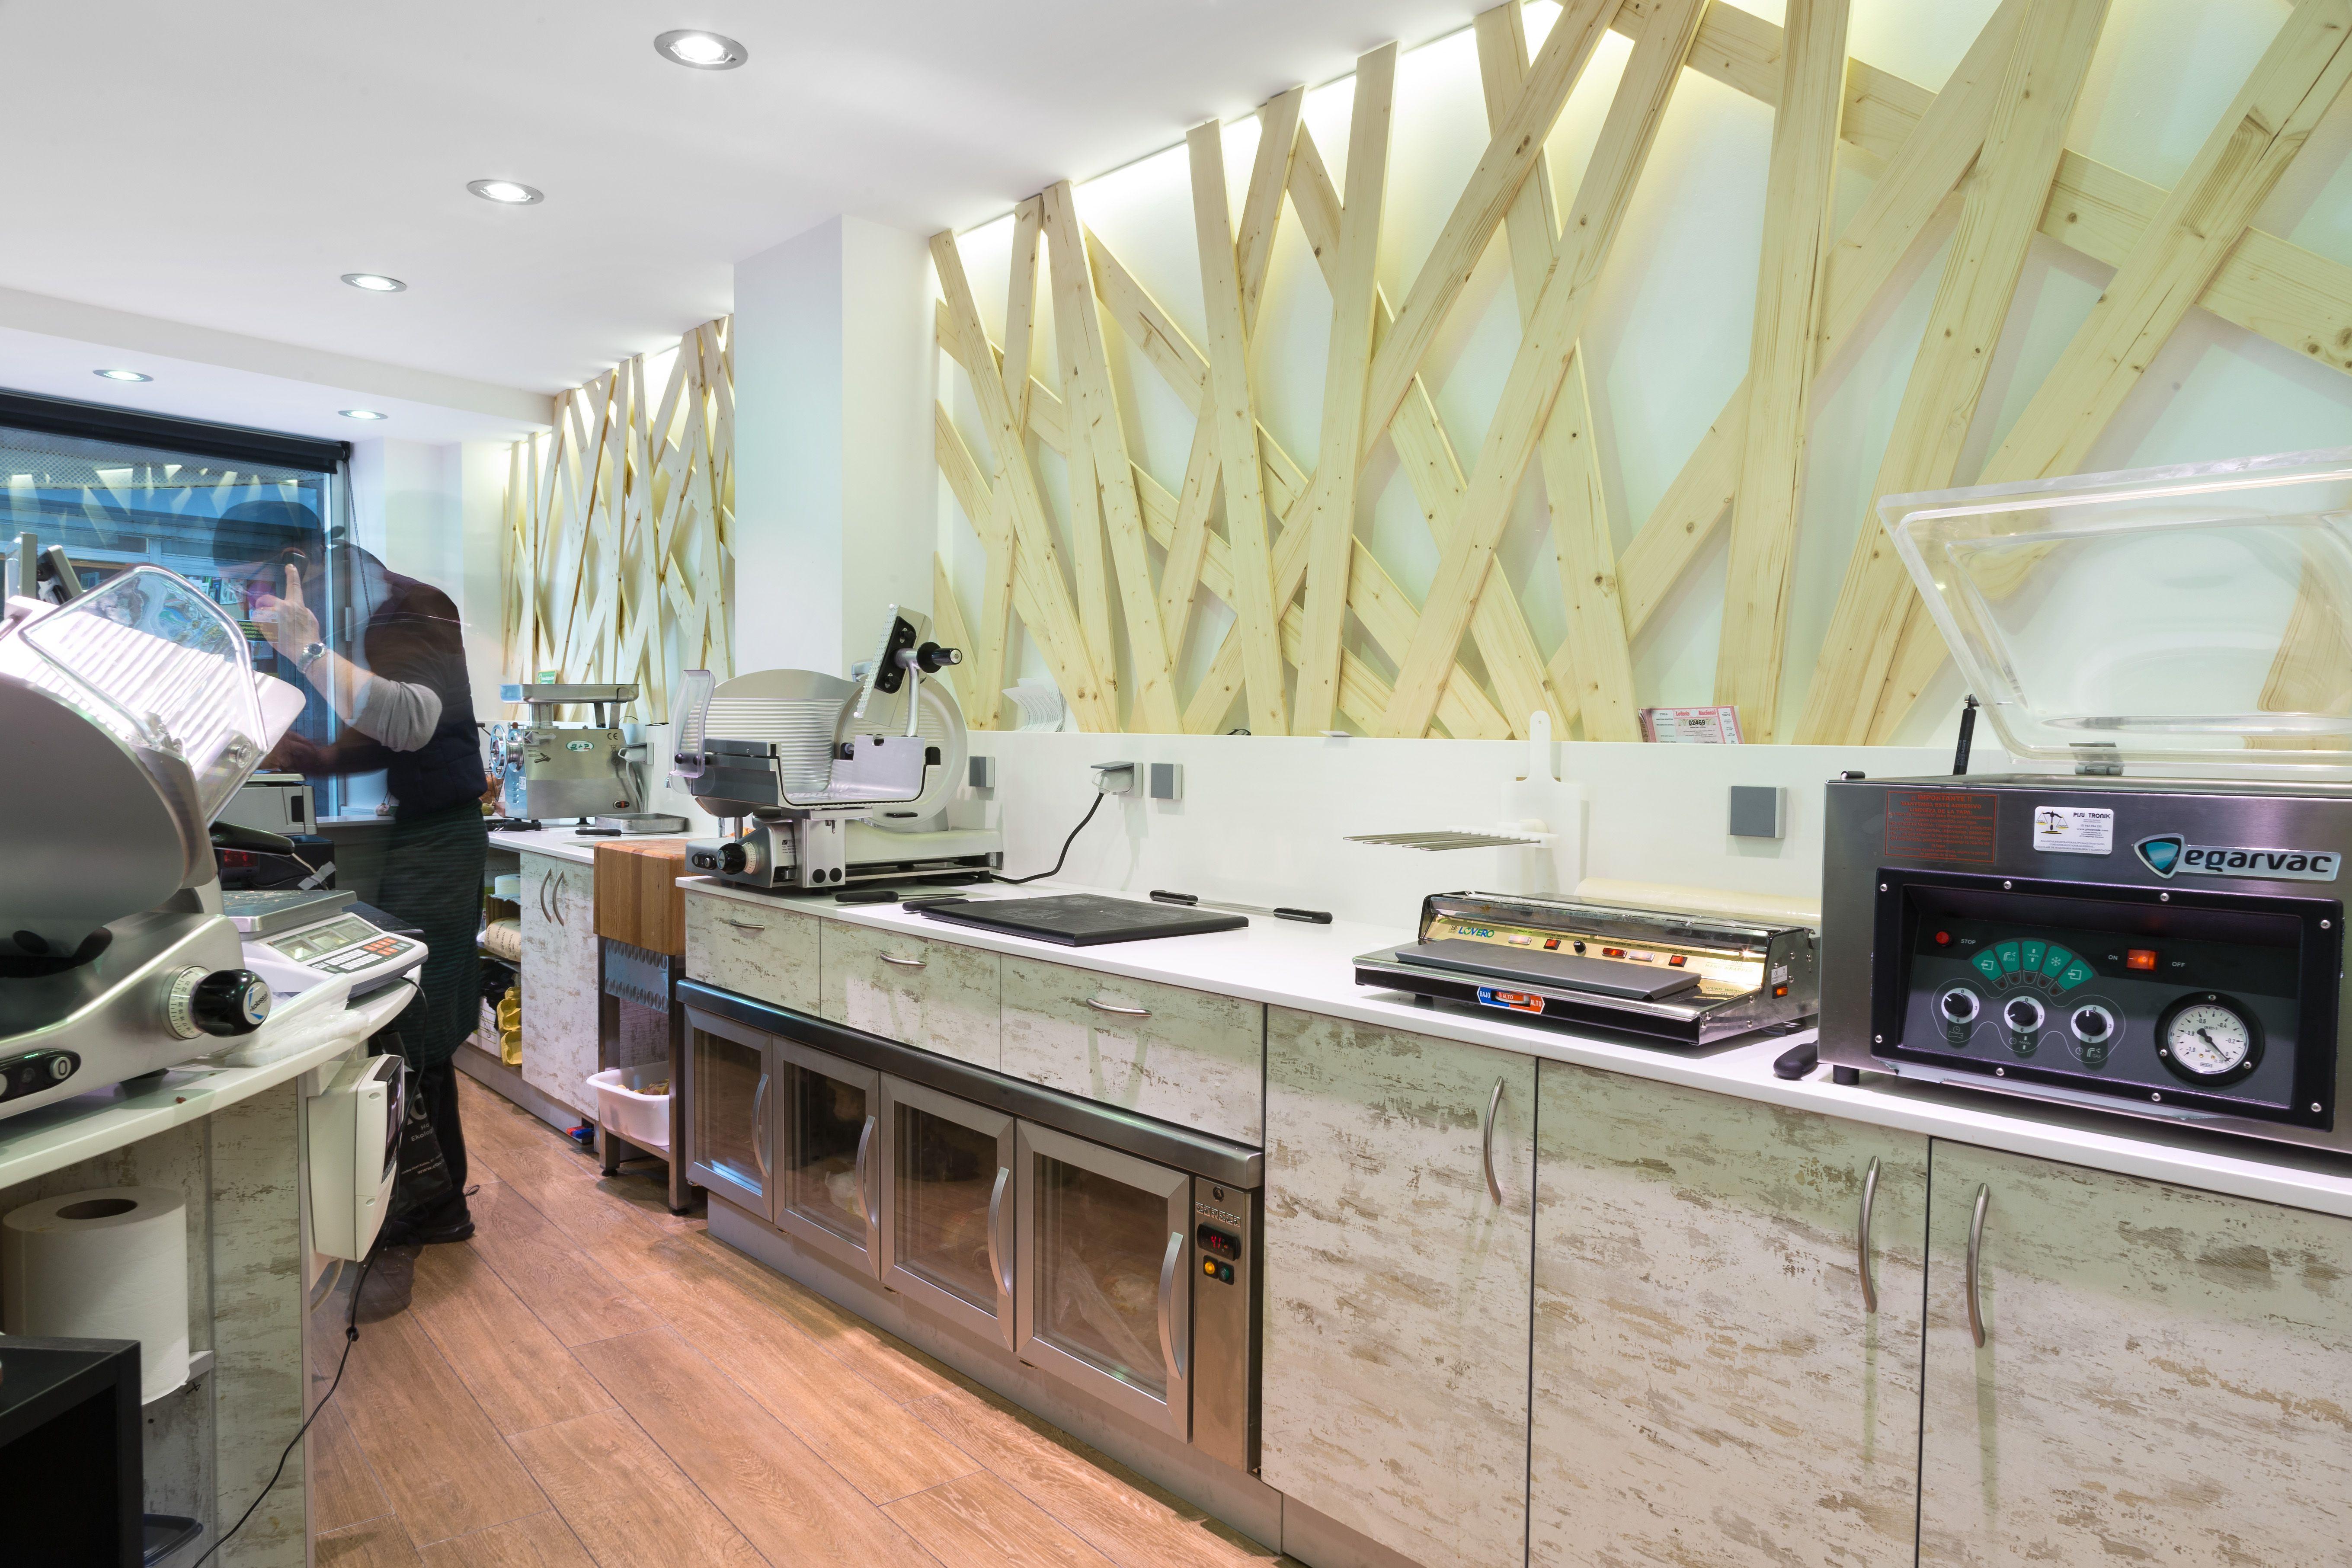 Carnicer a moderna dise o de carnicer as modern butchery boucherie design mostrador - Mostradores para carniceria ...